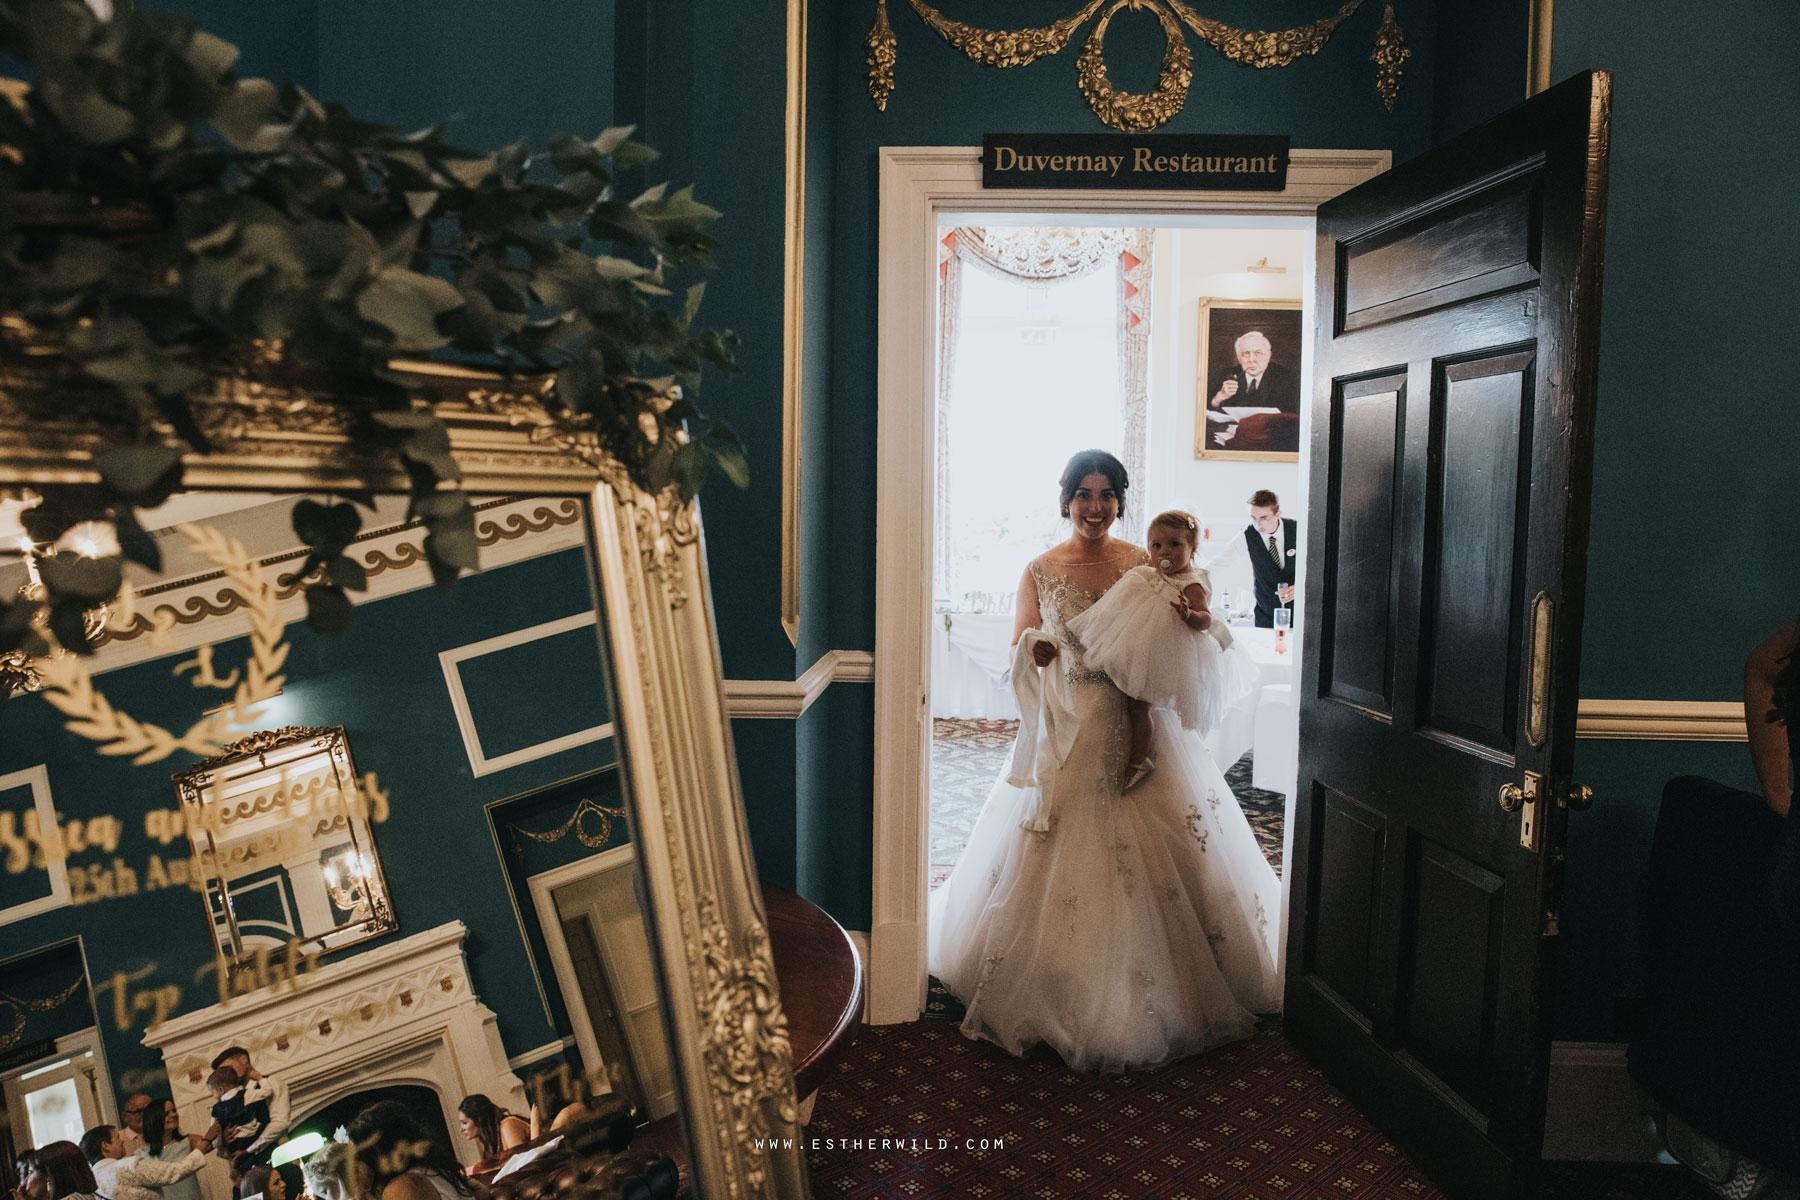 Lynford_Hall_Wedding_Thetford_Mundford_Esther_Wild_Photographer_IMG_3004.jpg